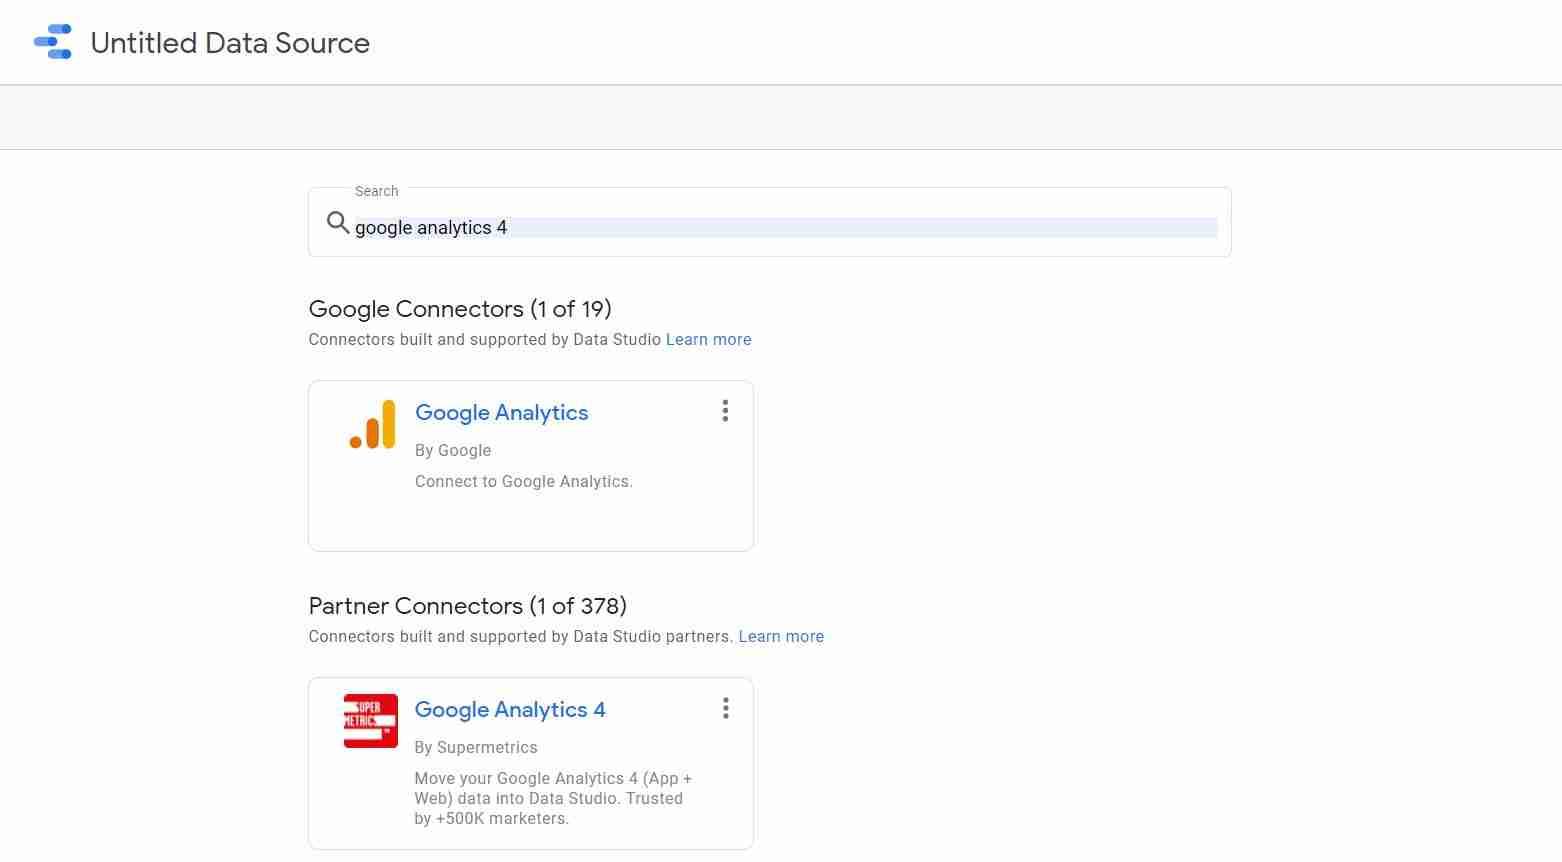 Supermetrics Google Analytics 4 connector